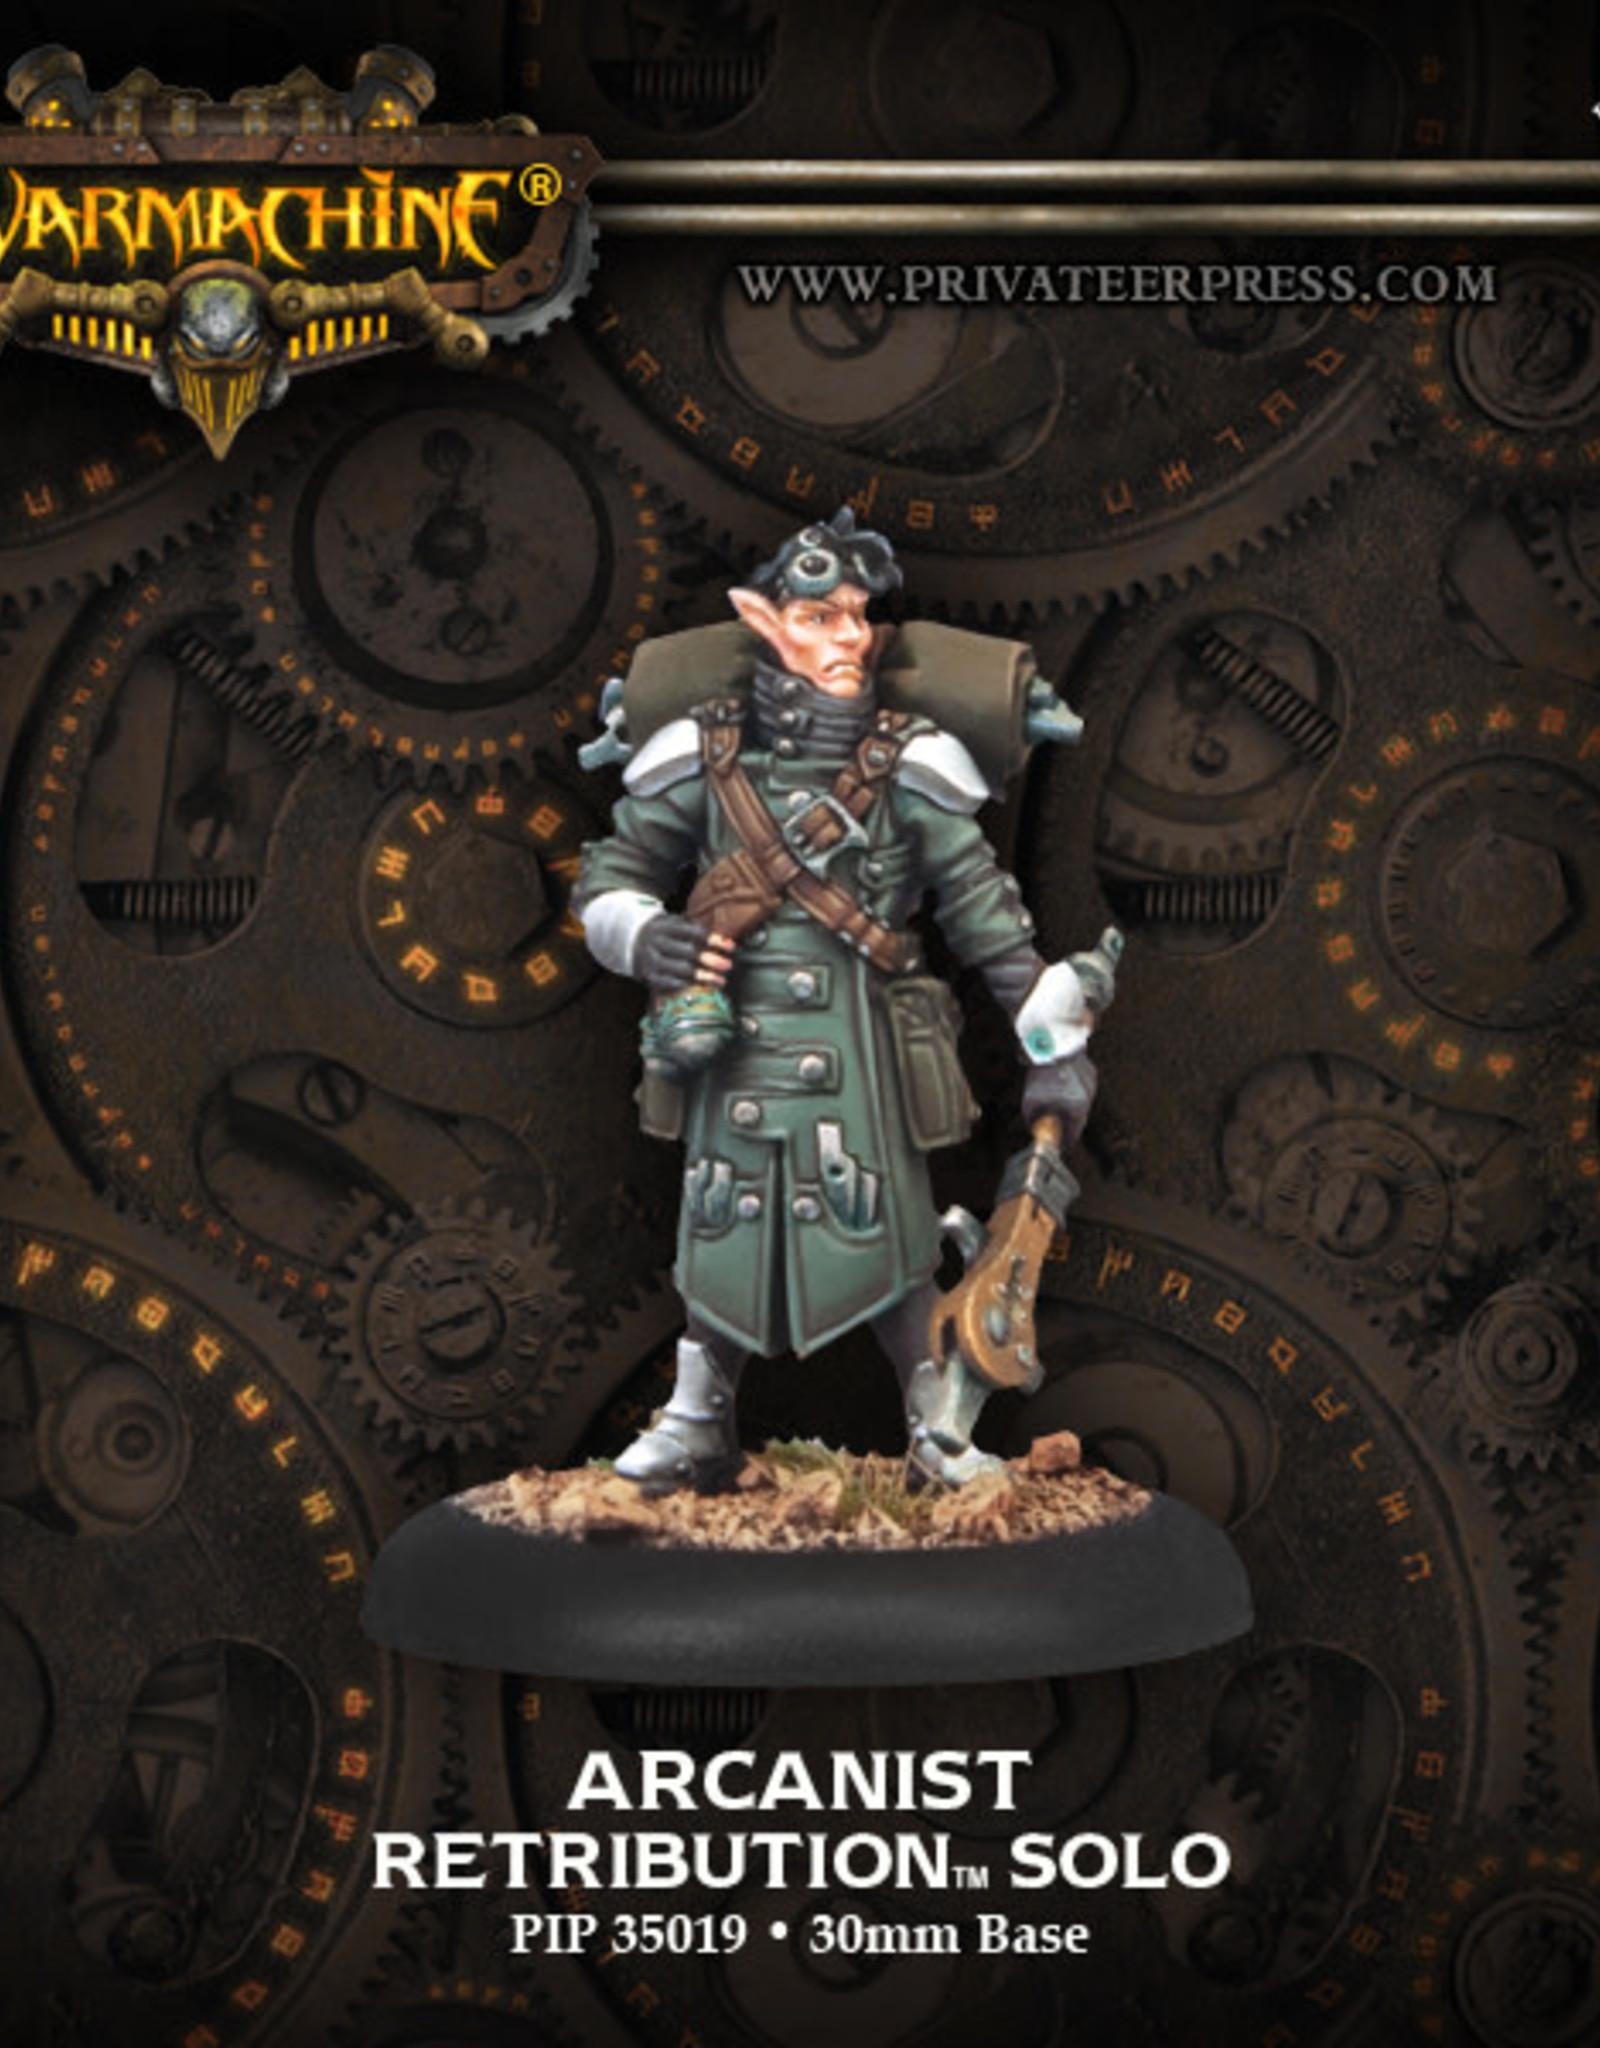 Warmachine Scyrah - Arcanist